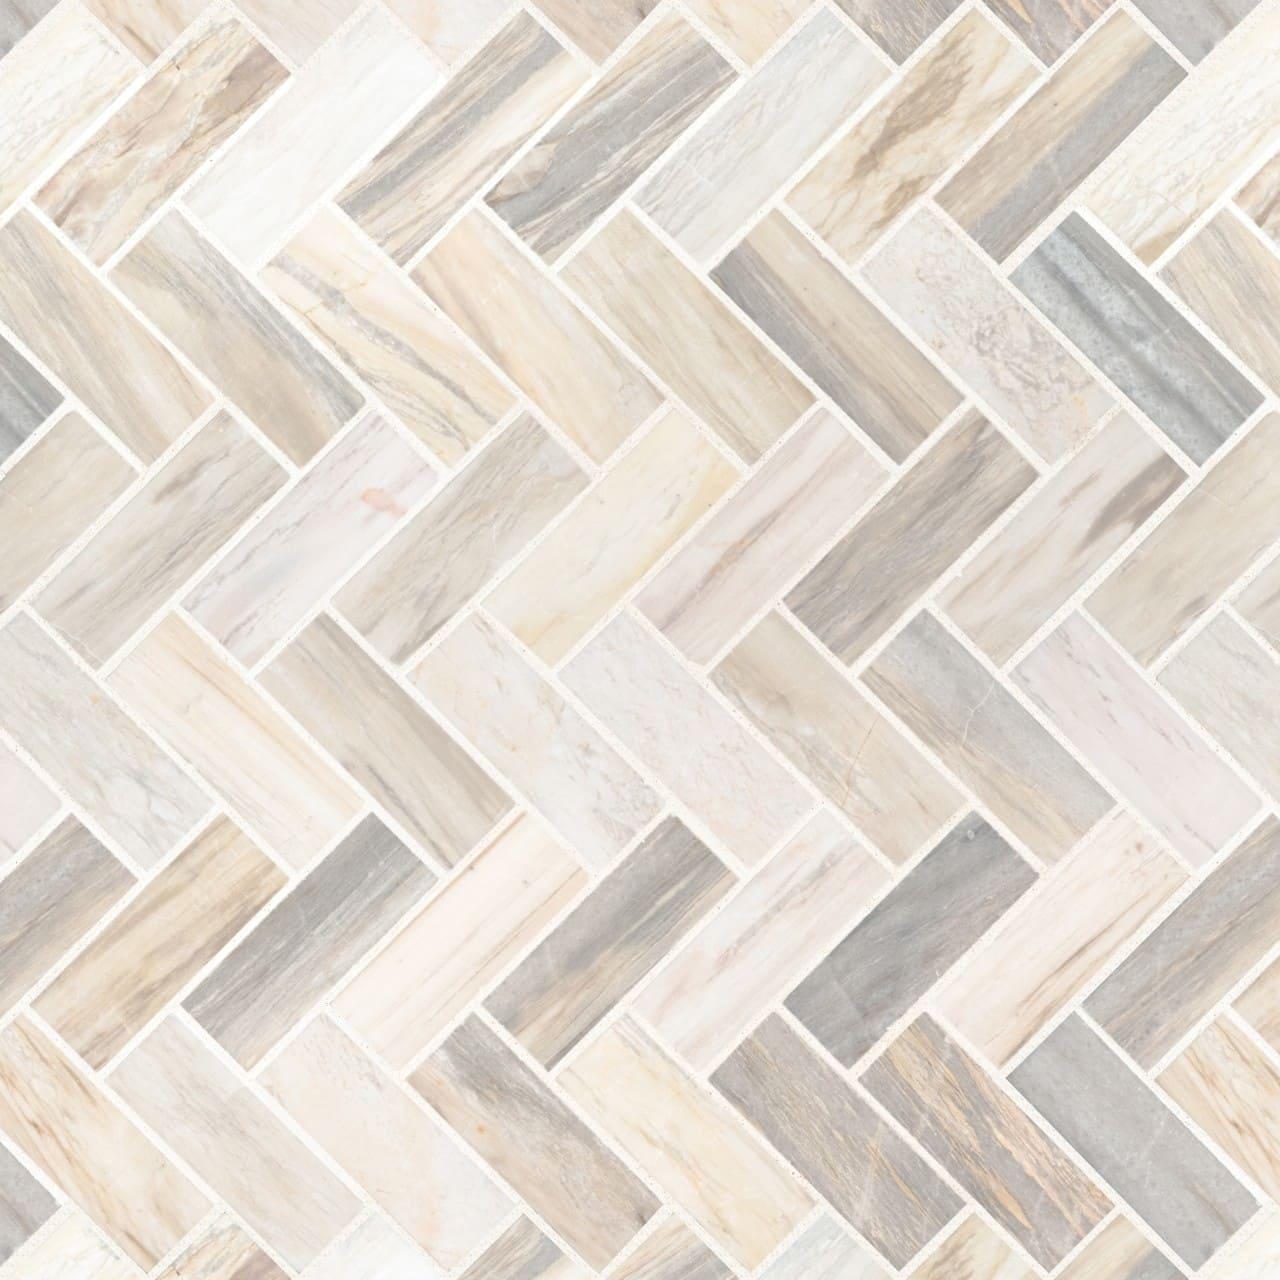 Angora Herringbone Glass Mosaic Tile